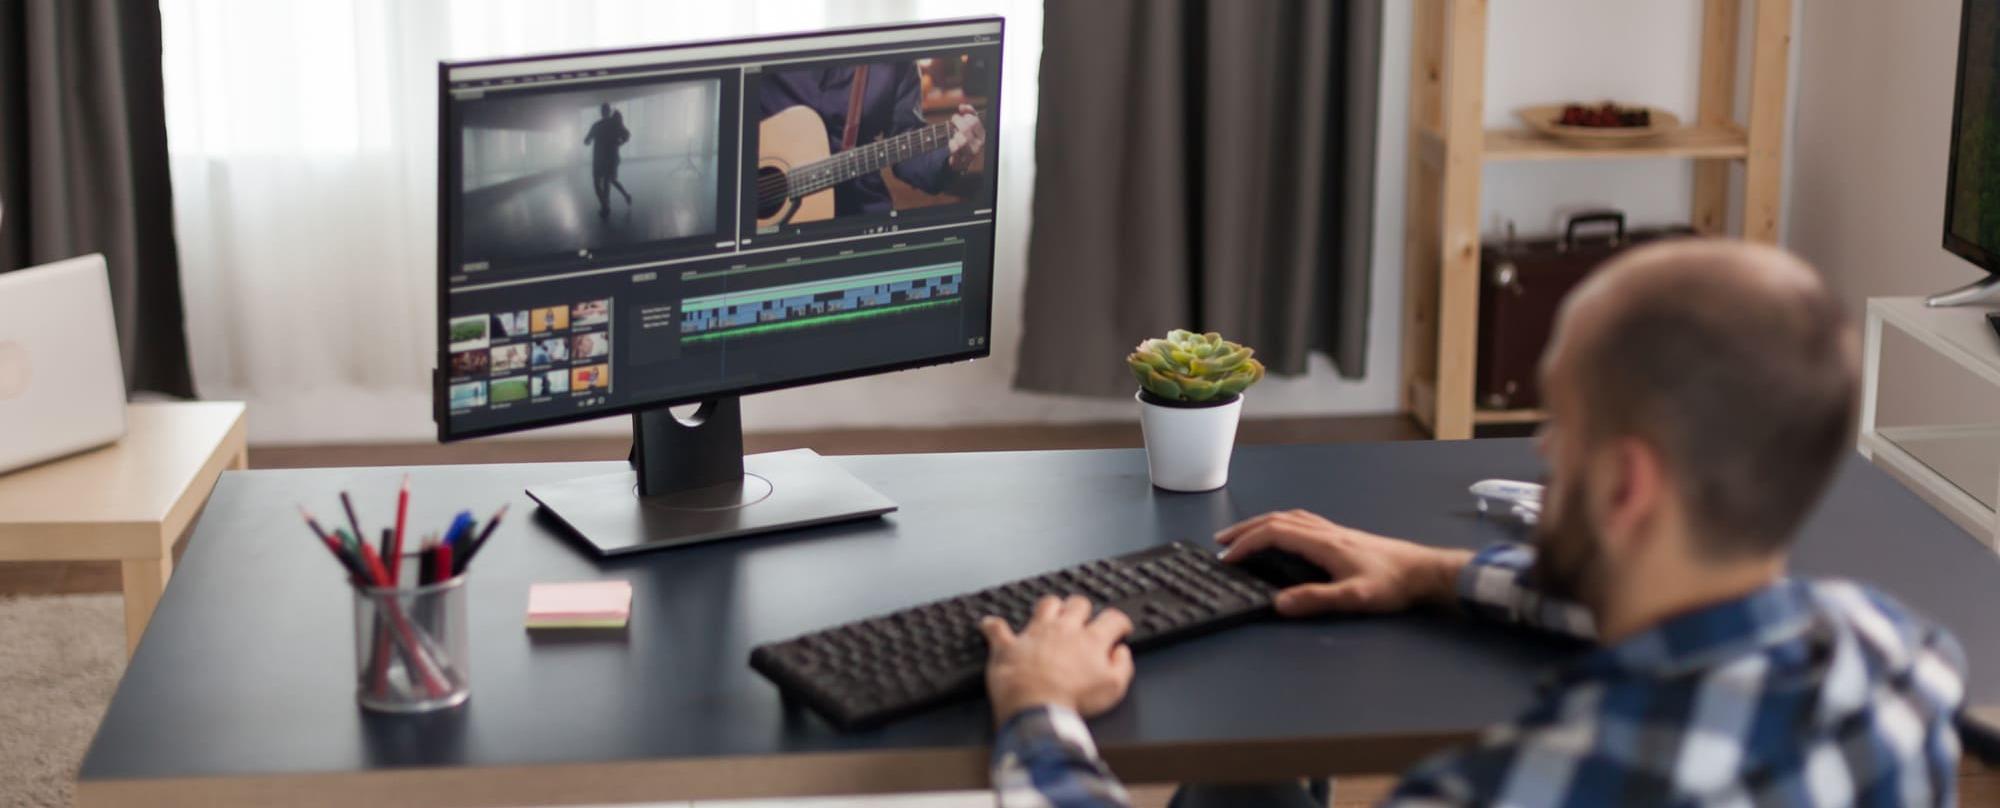 Werksstudent Content Creator Foto/Video (m/w/d)